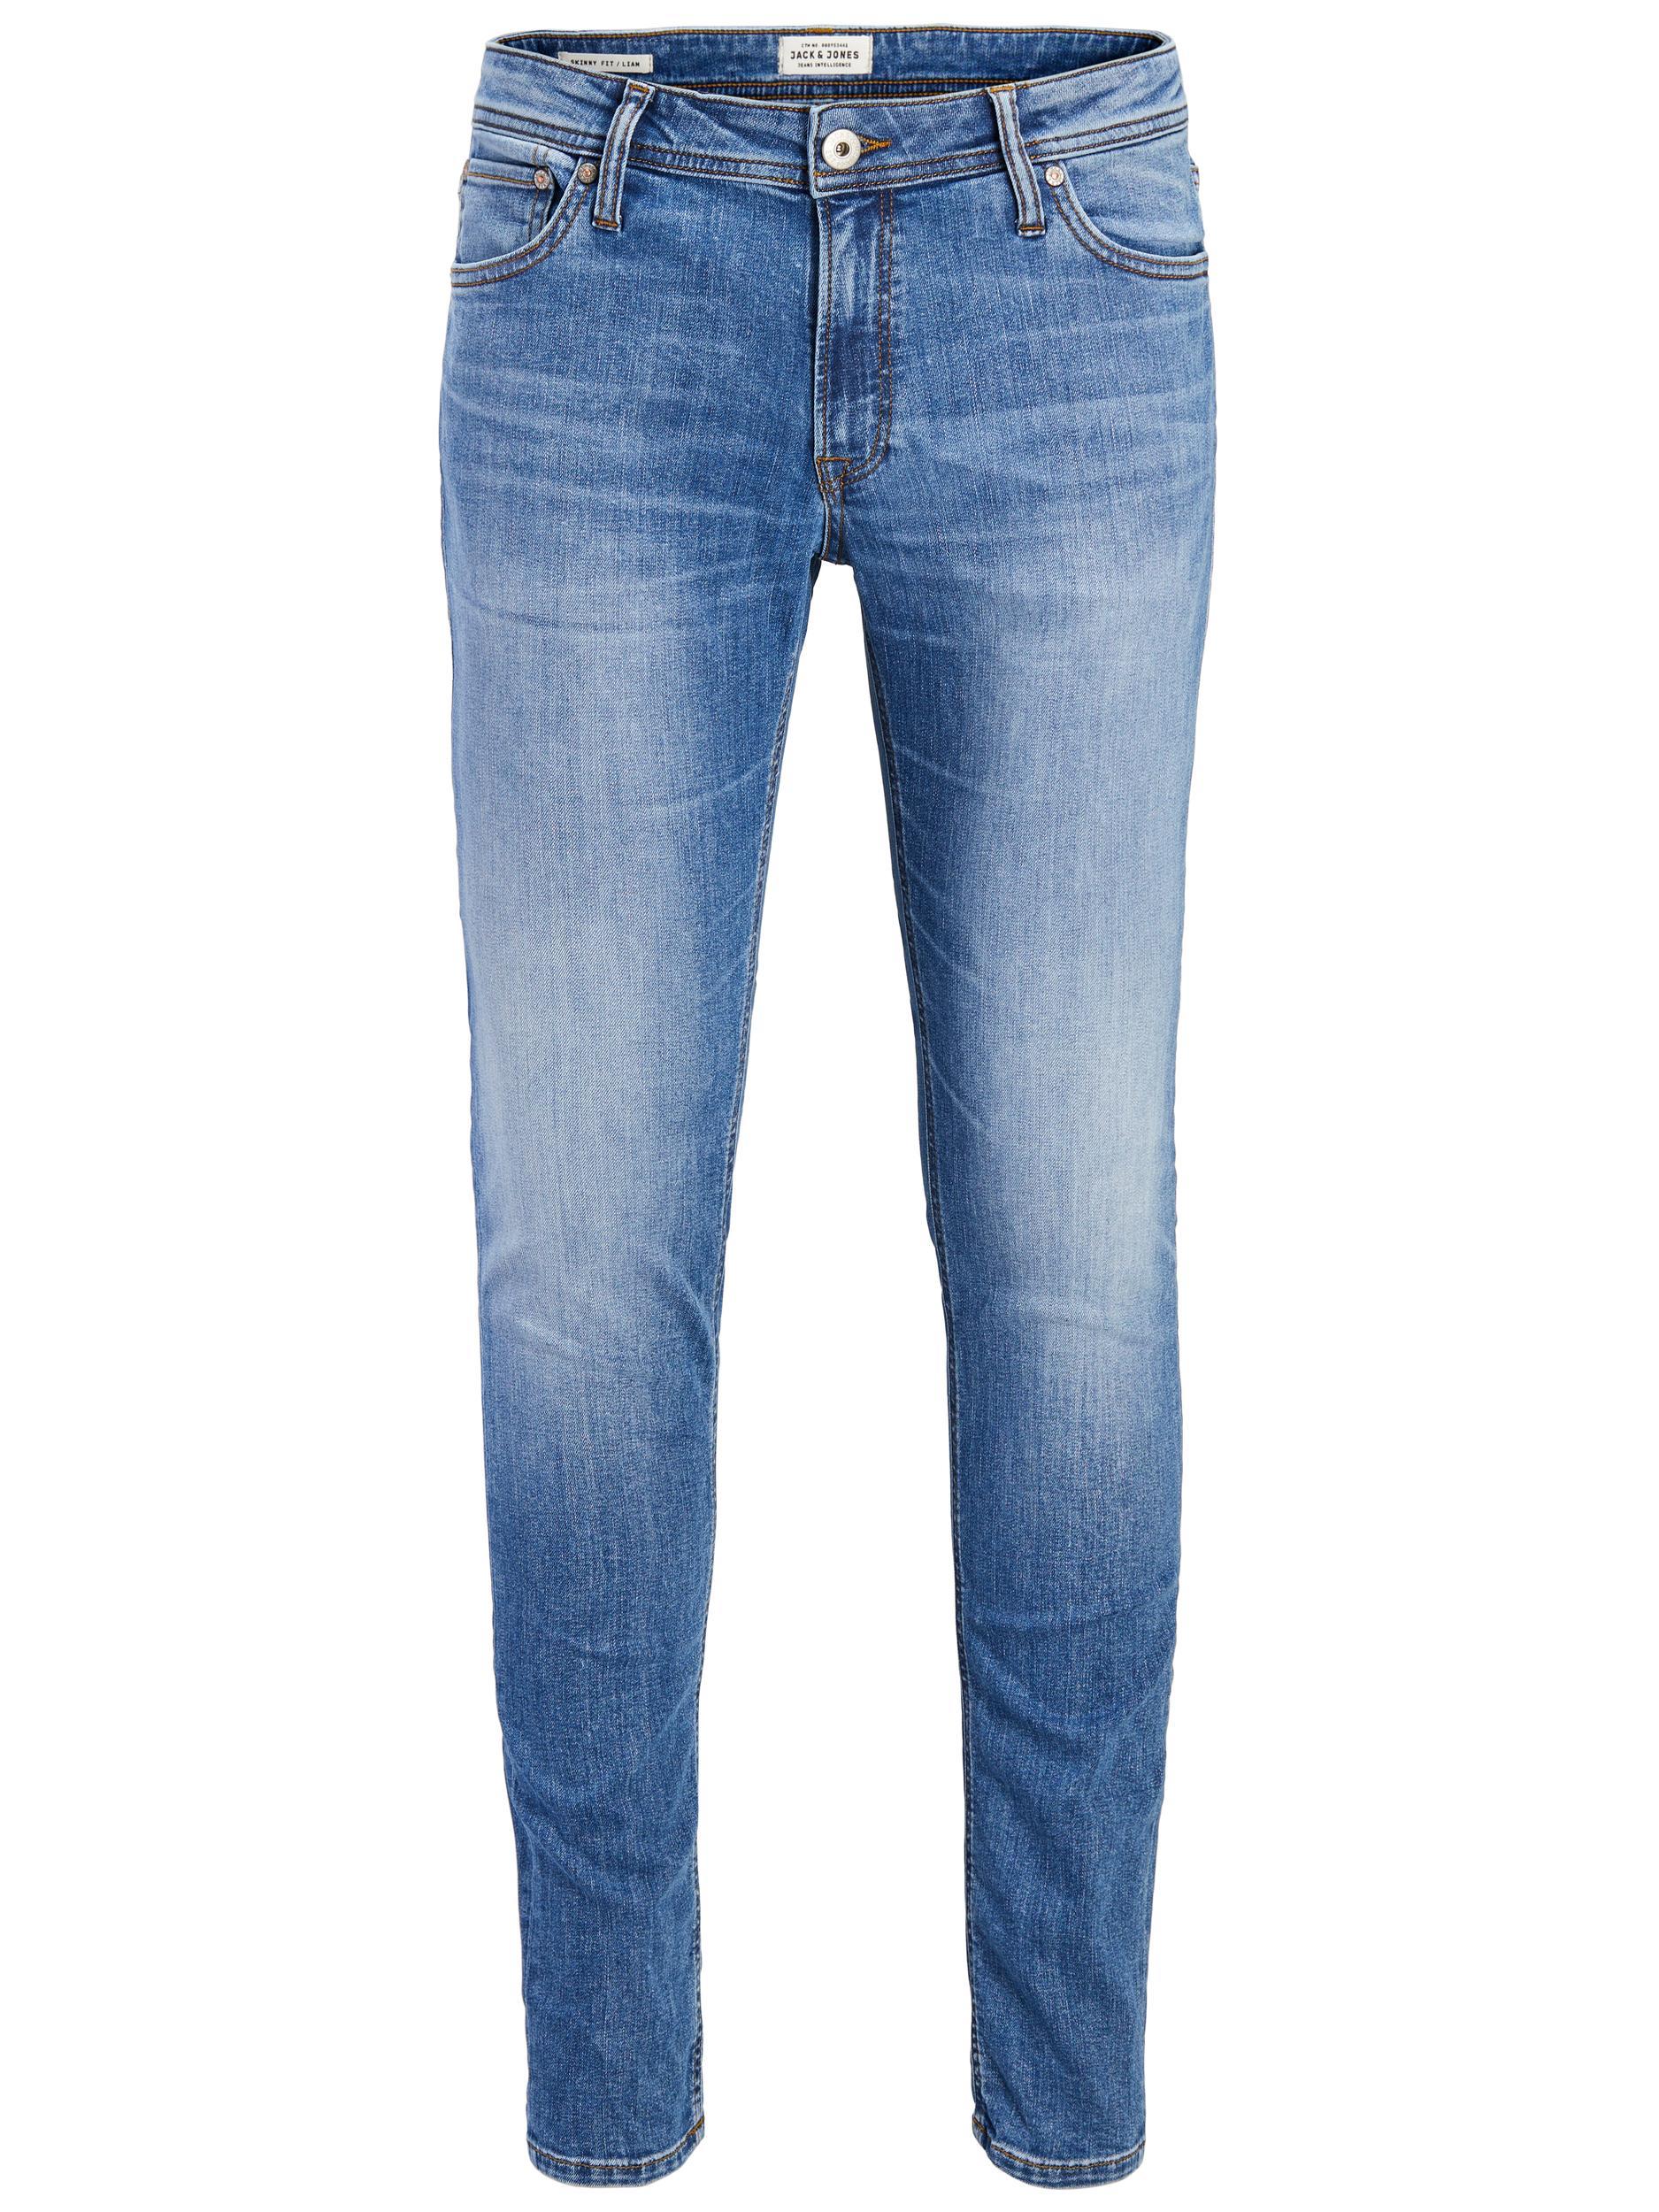 Jack & Jones Liam Original 815 jeans